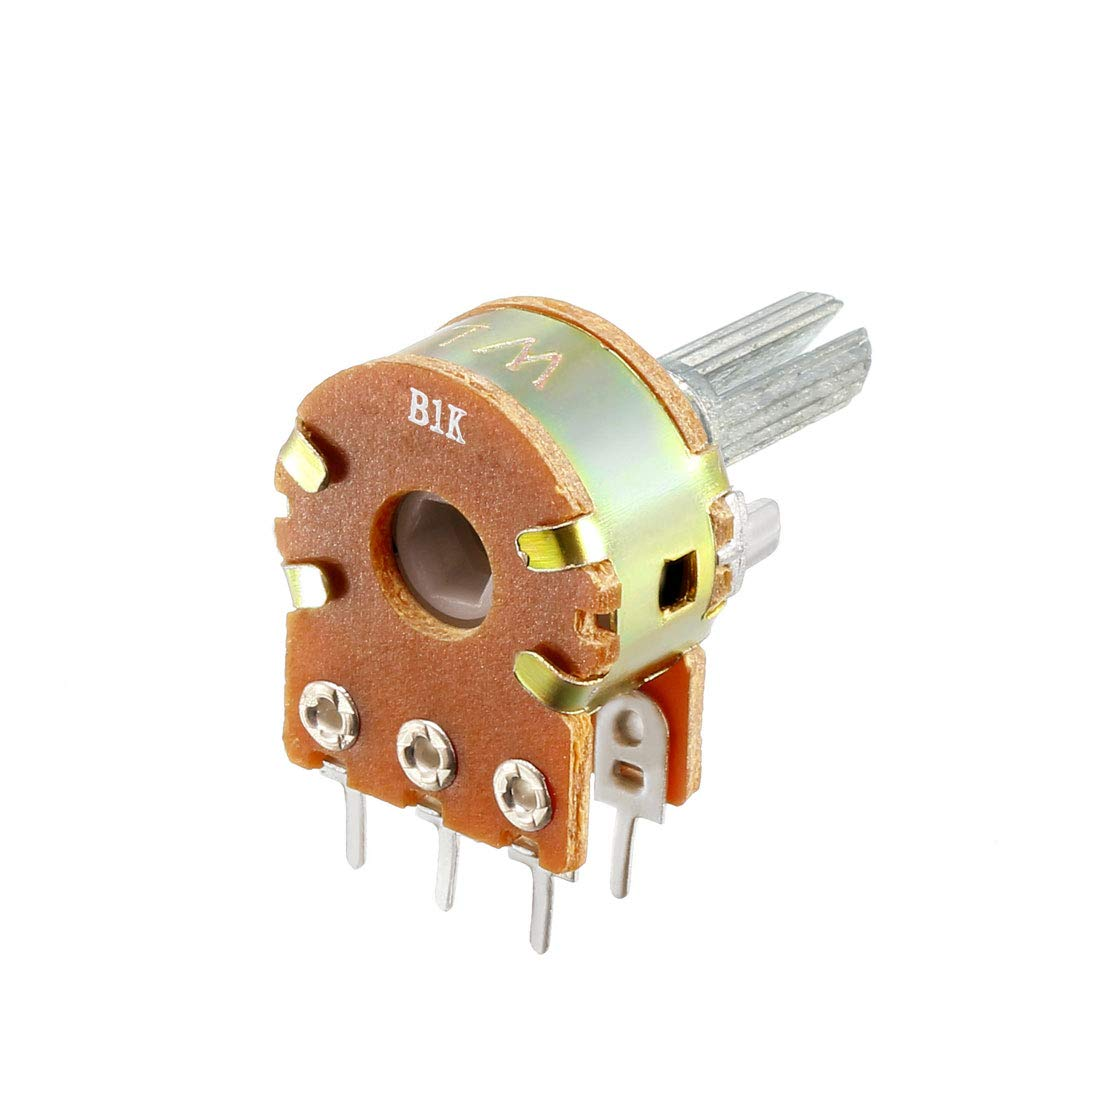 uxcell 8pcs 1K 20K 5K 10K Variable Resistor Single Rotary Carbon Potentiometer Knobs WH148